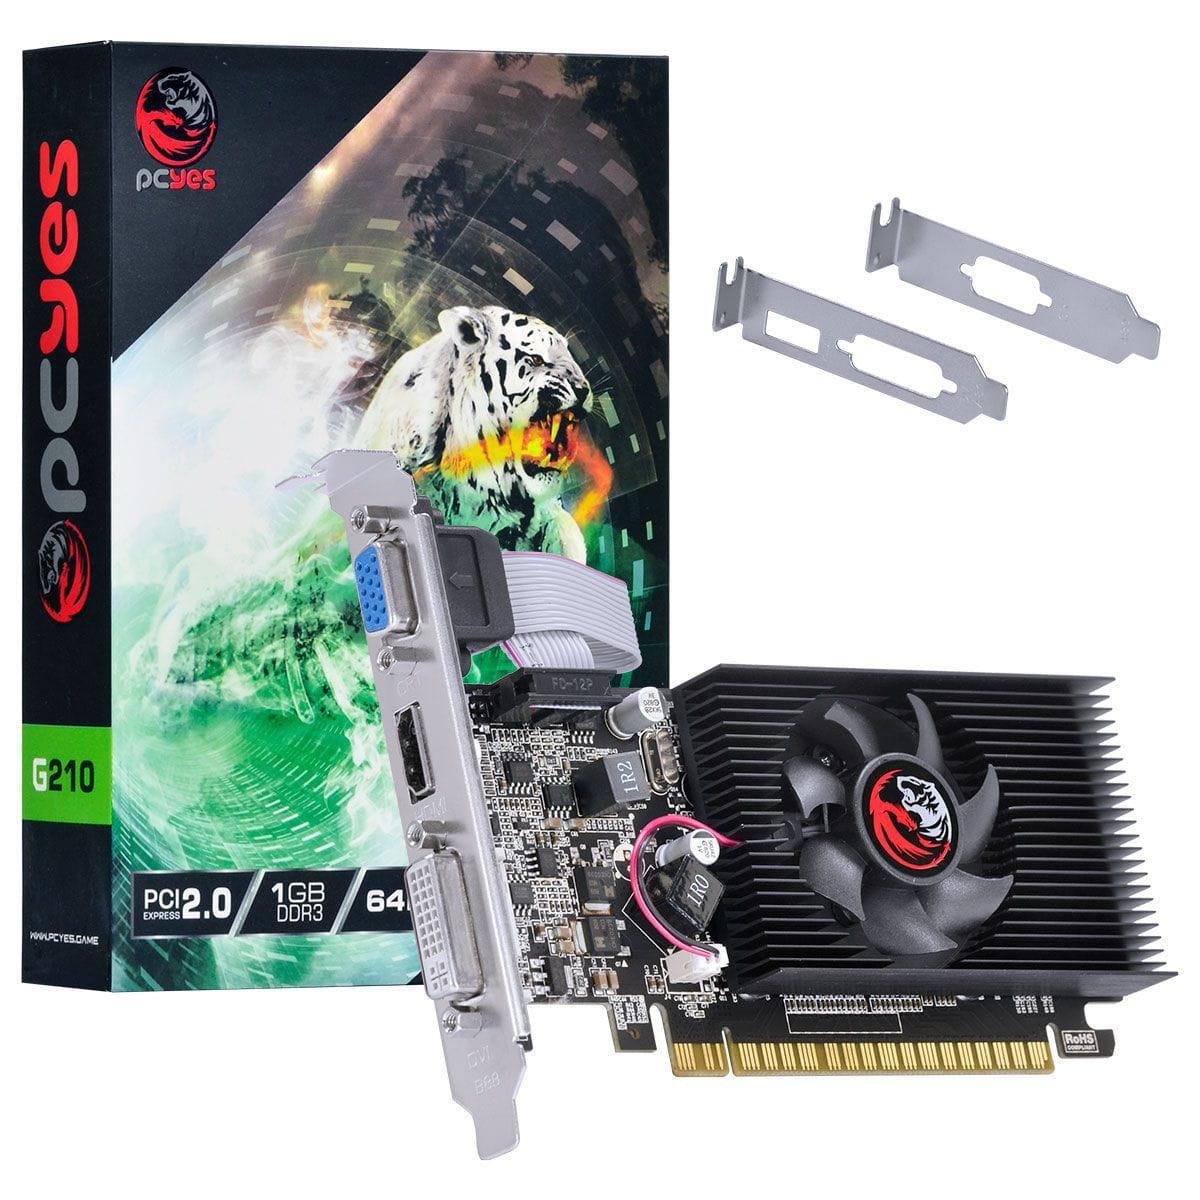 PLACA DE VIDEO PCI-E LOW PROFILE G210 1GB DDR3 64BITS PCYES